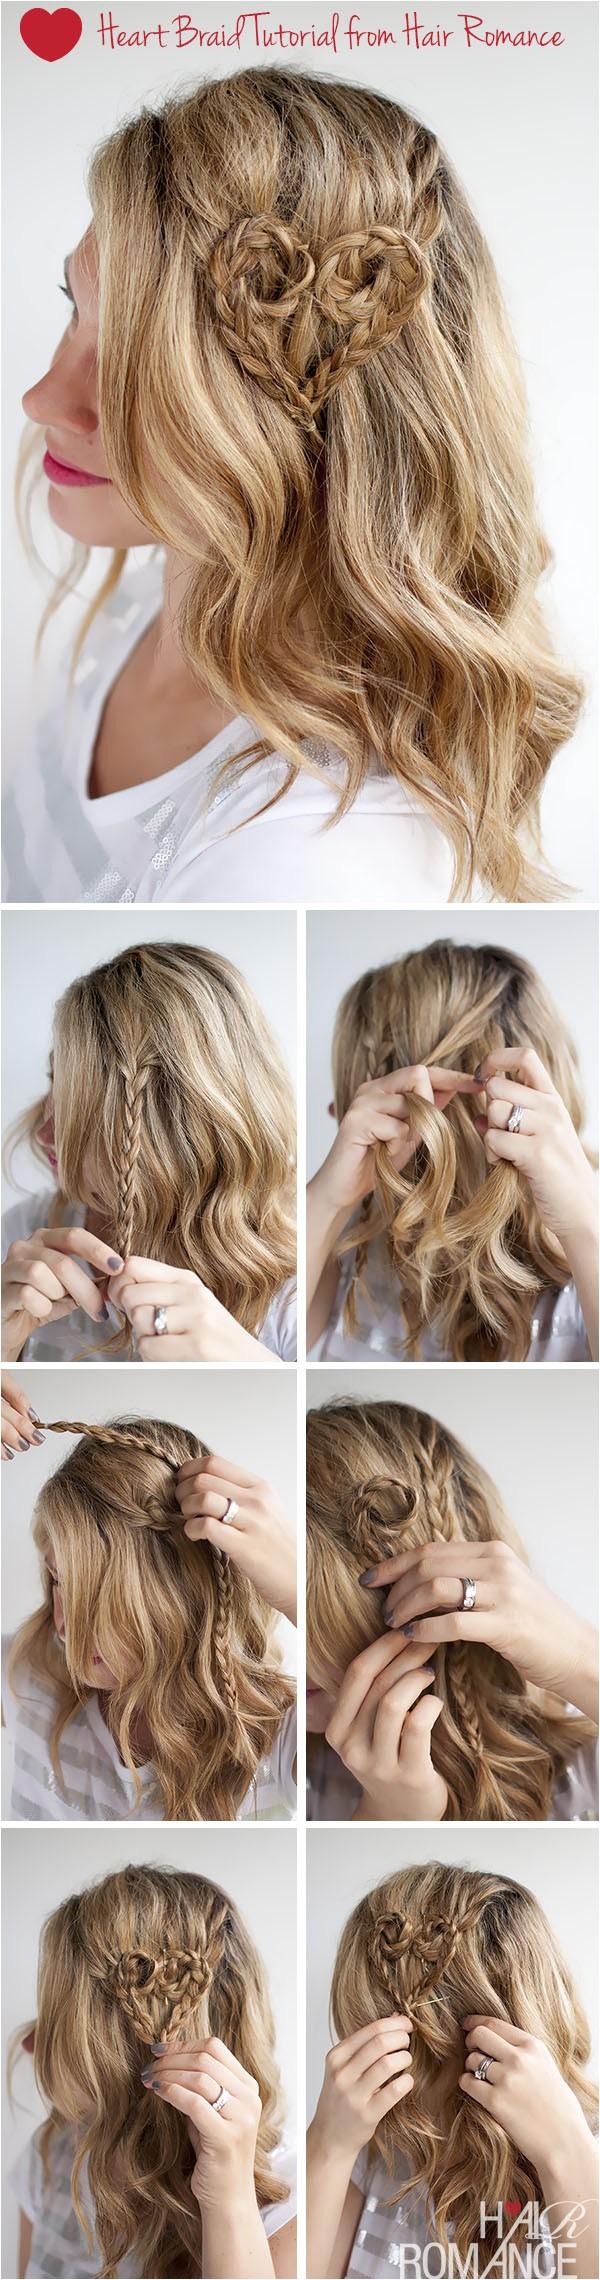 valentines day hairstyle tutorial heart braid hairstyle